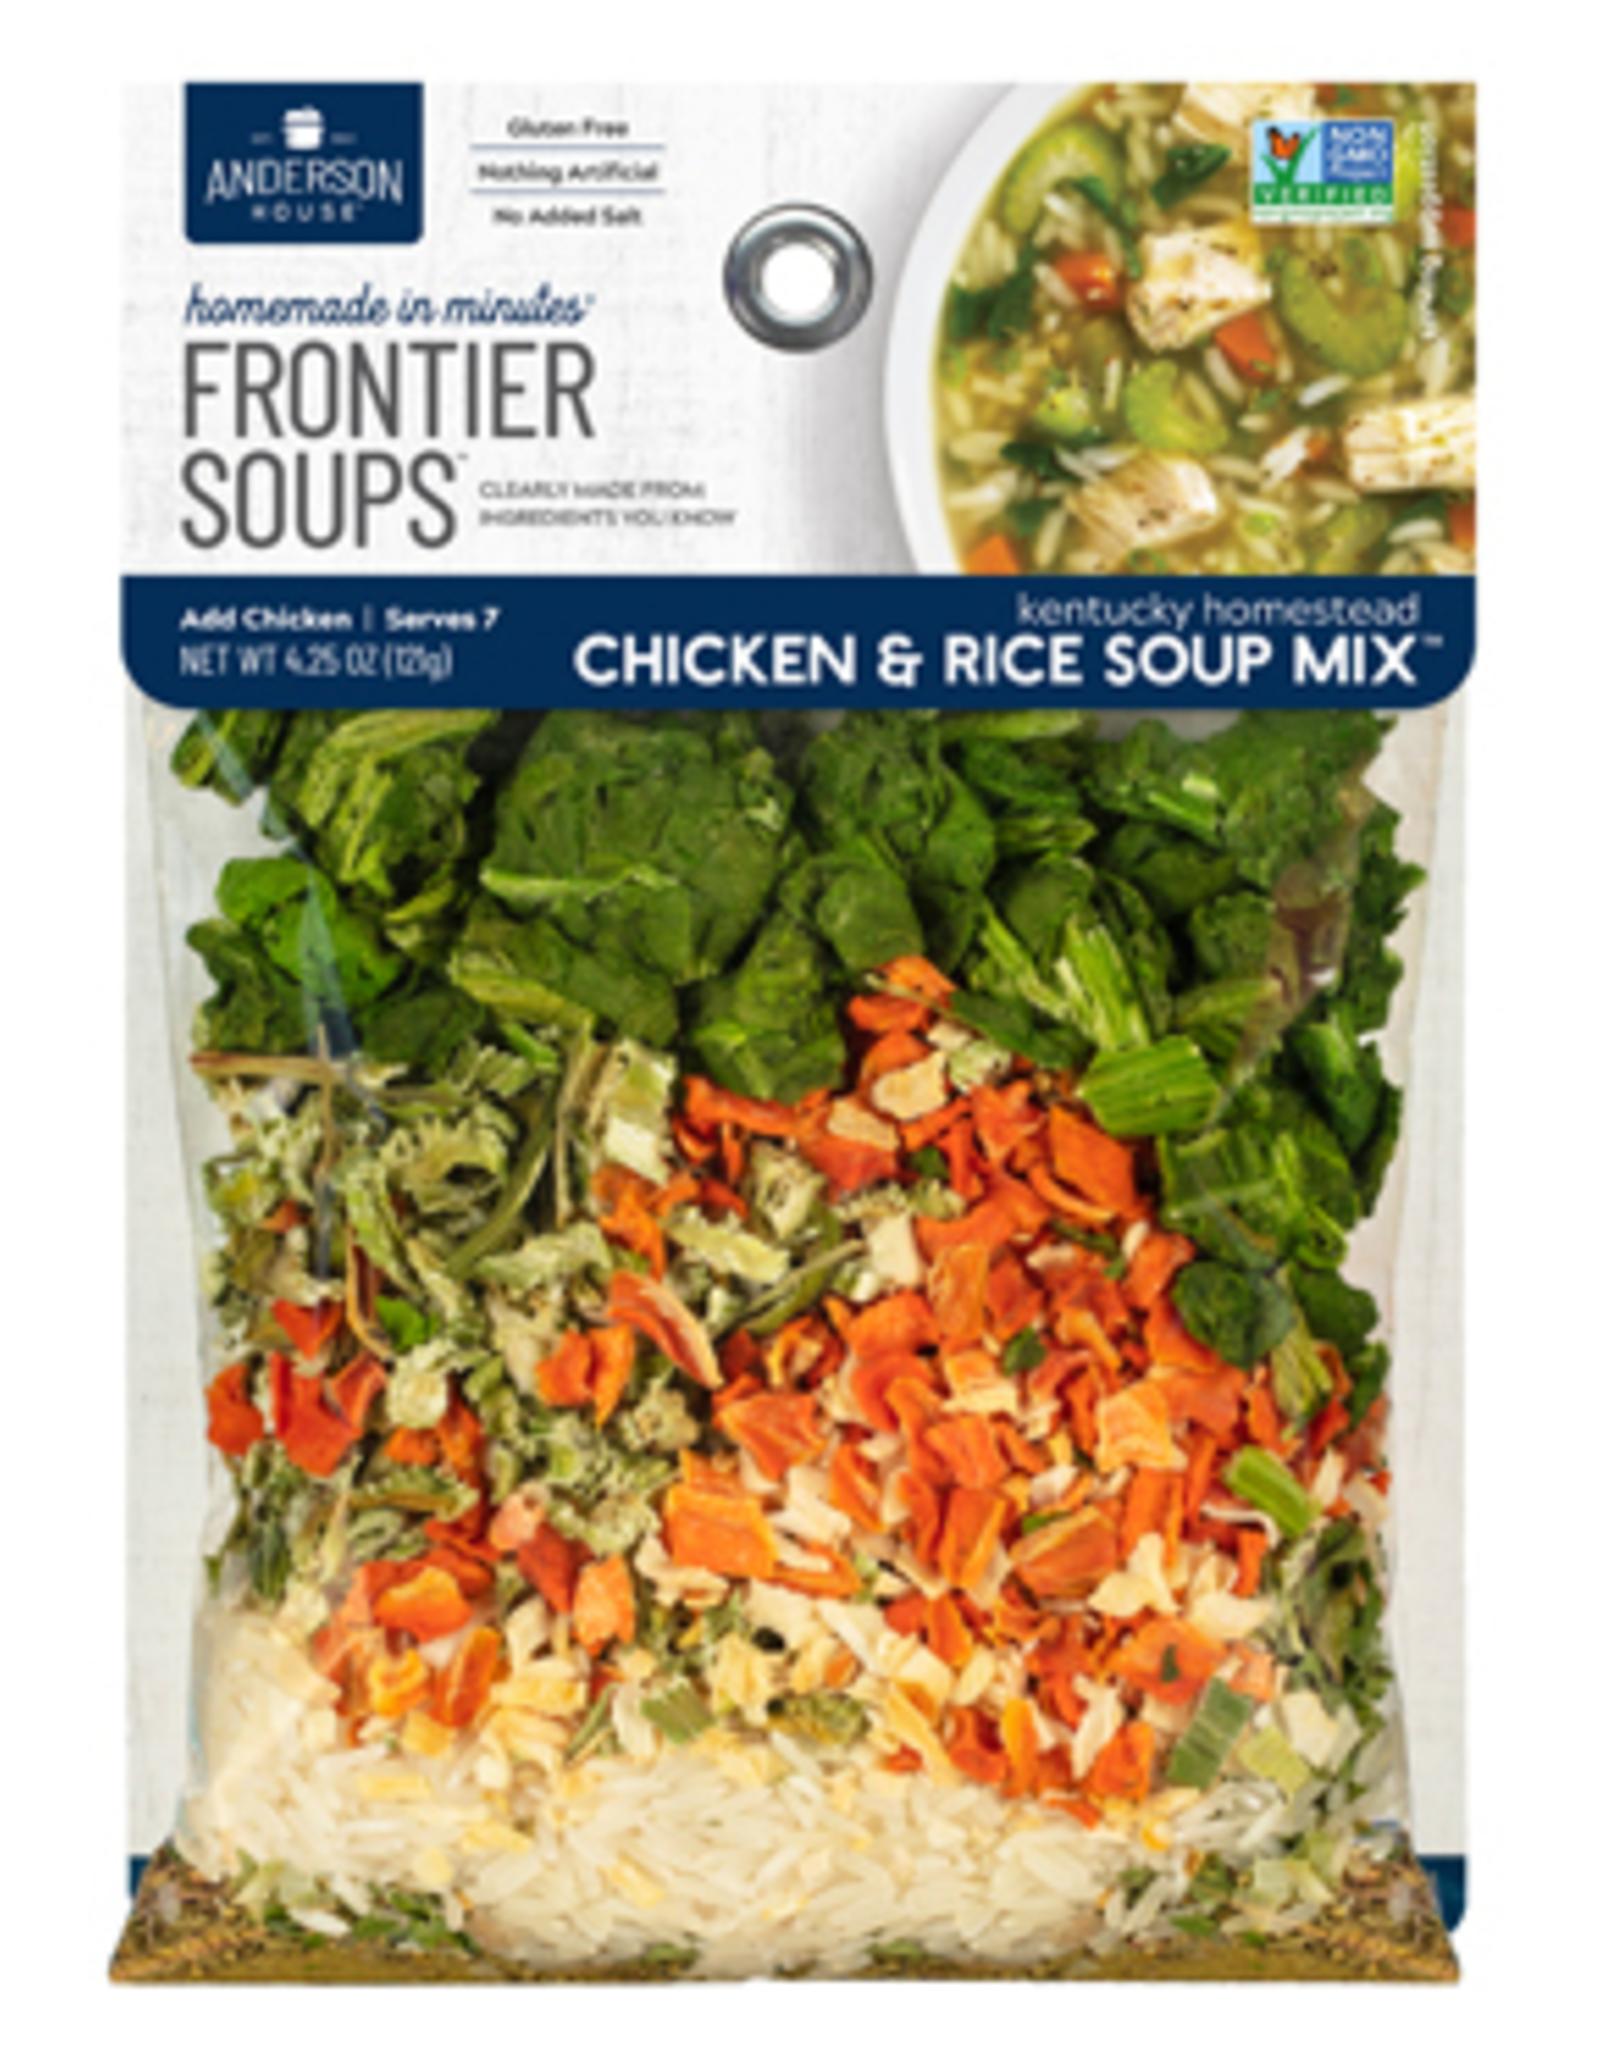 Frontier Soups Kentucky Homestead Chicken & Rice Soup Mix